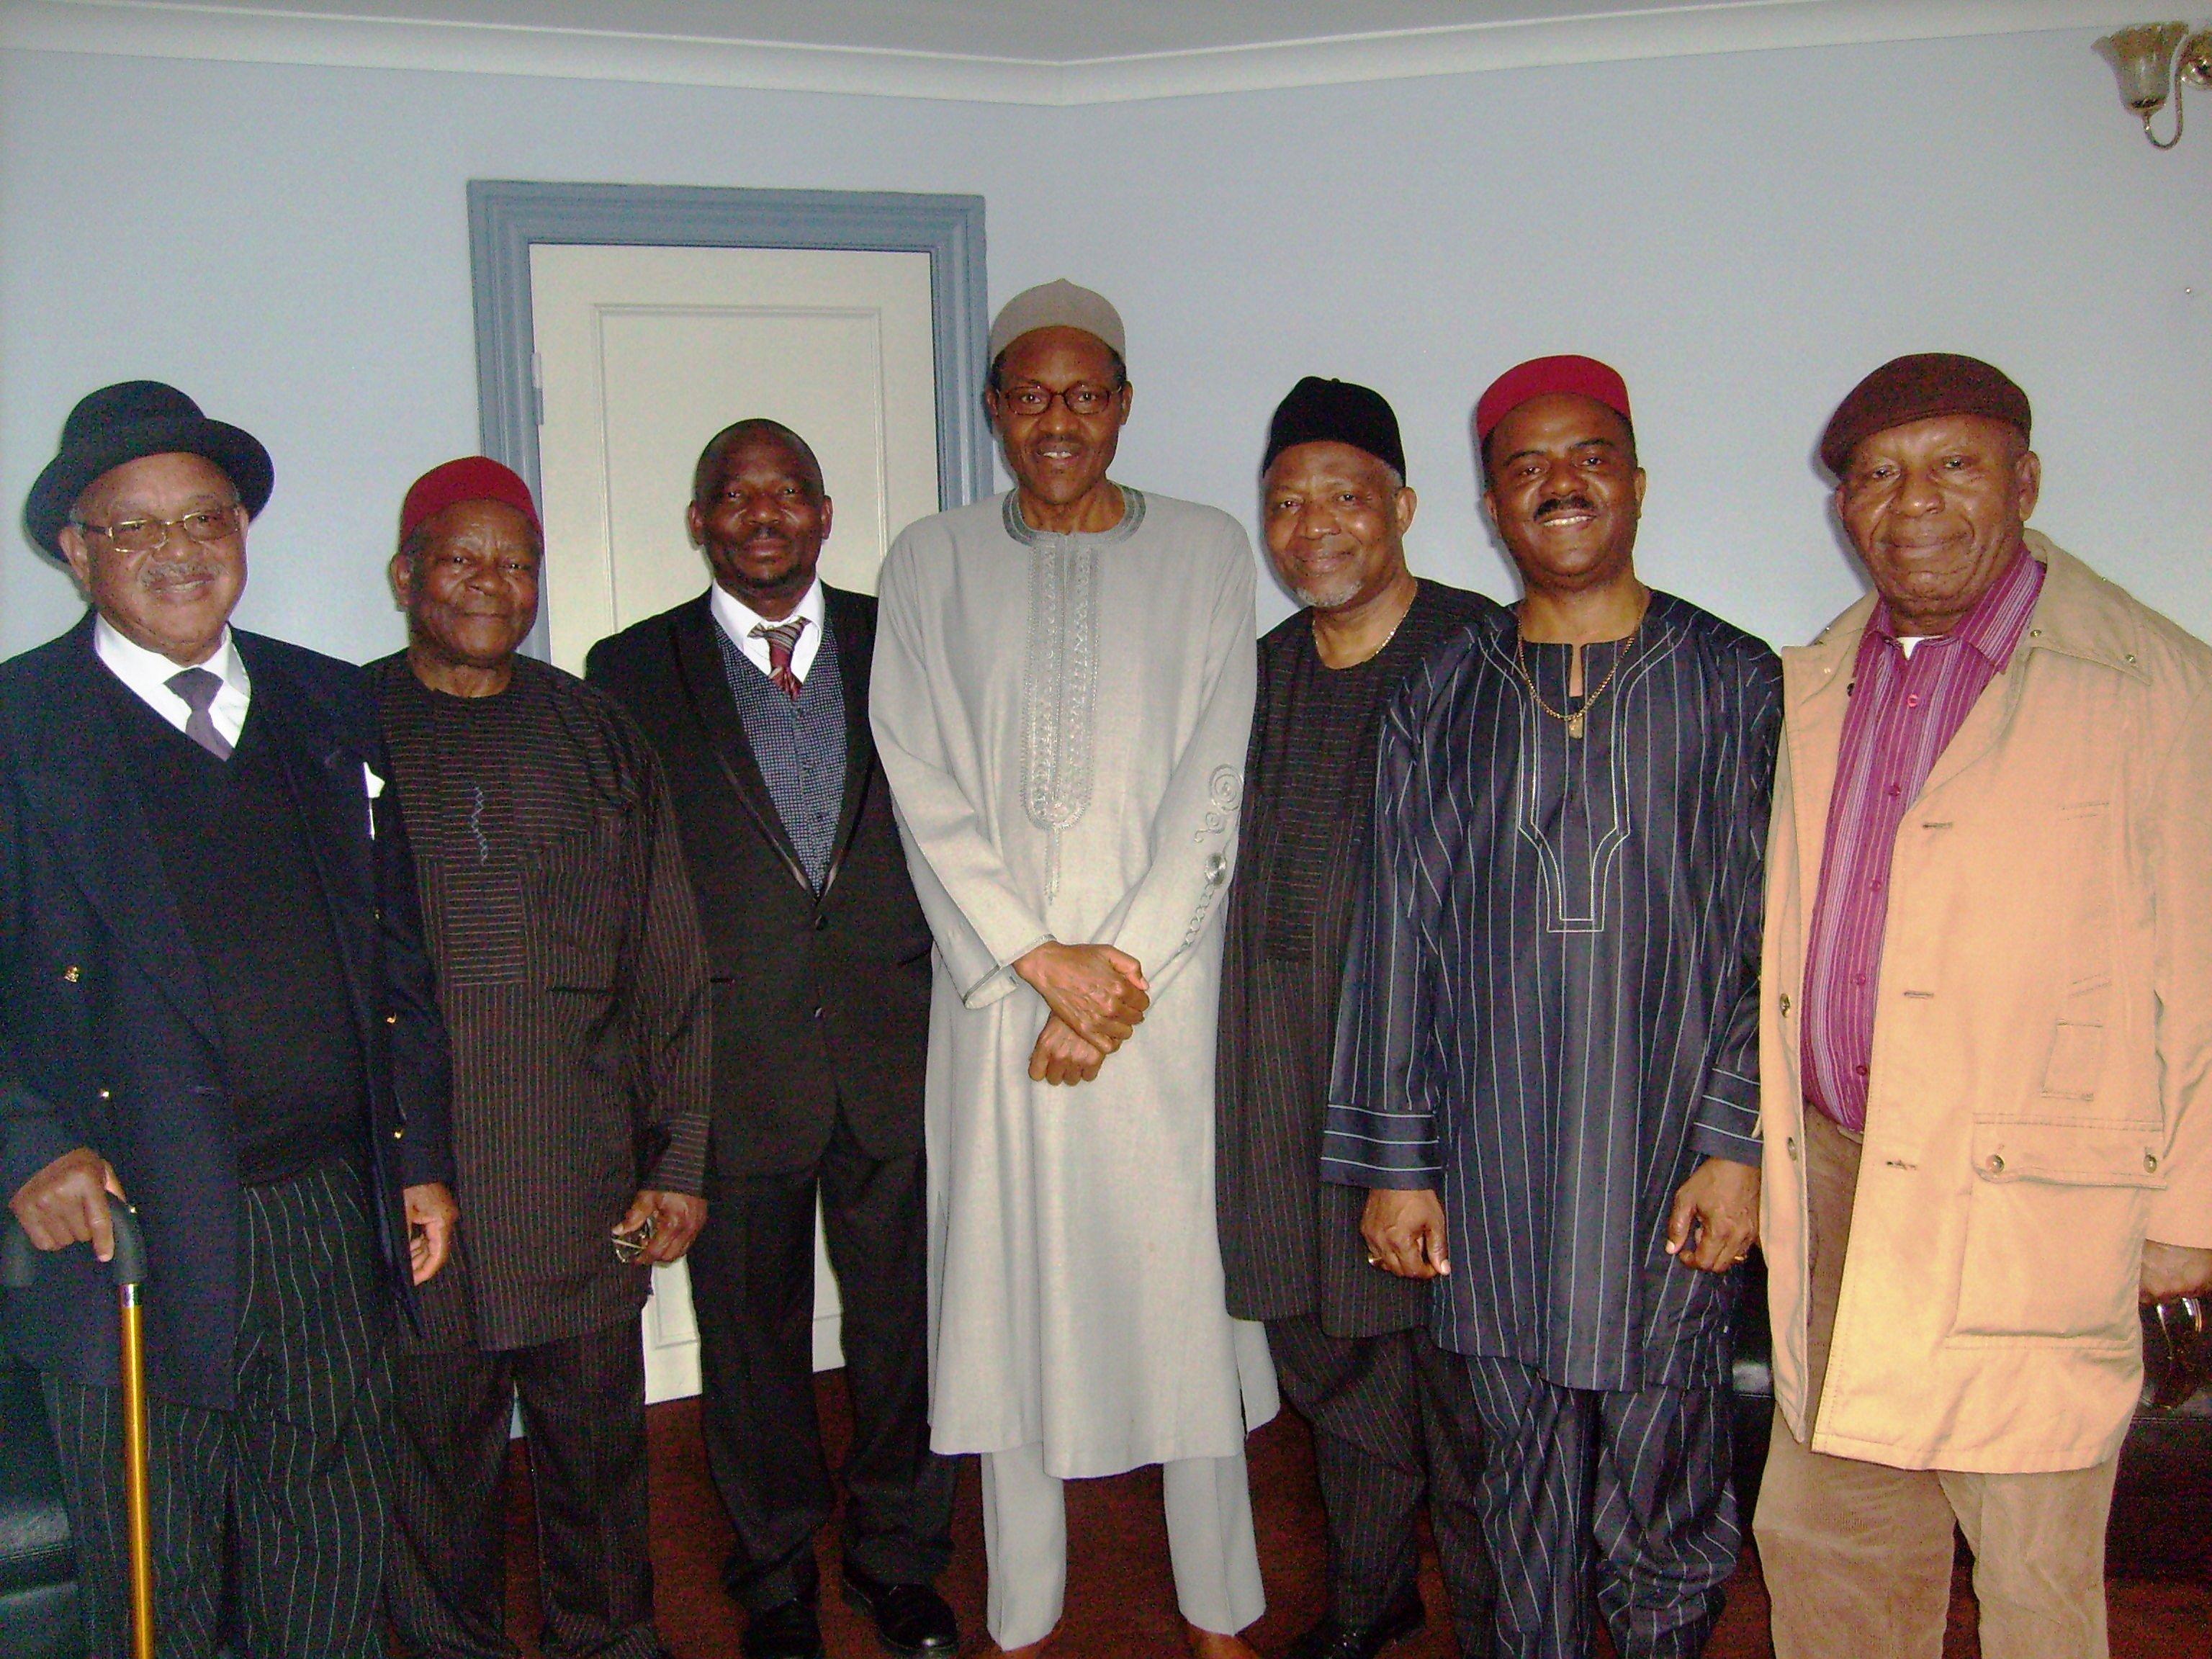 Buhari's Appointment: Uniting Southern Nigeria – By Oshiokpekhai Utu-Orbih